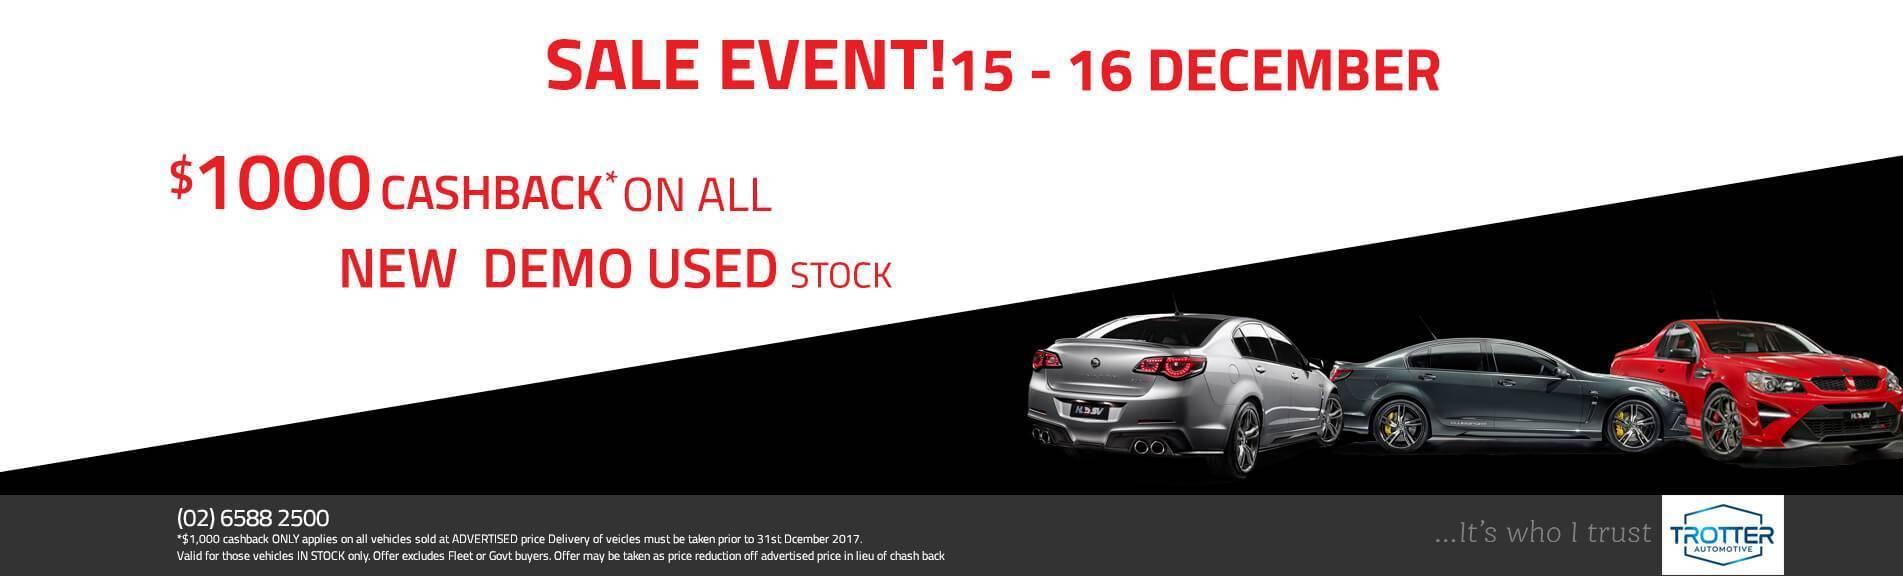 Port Macquarie HSV Sale Event